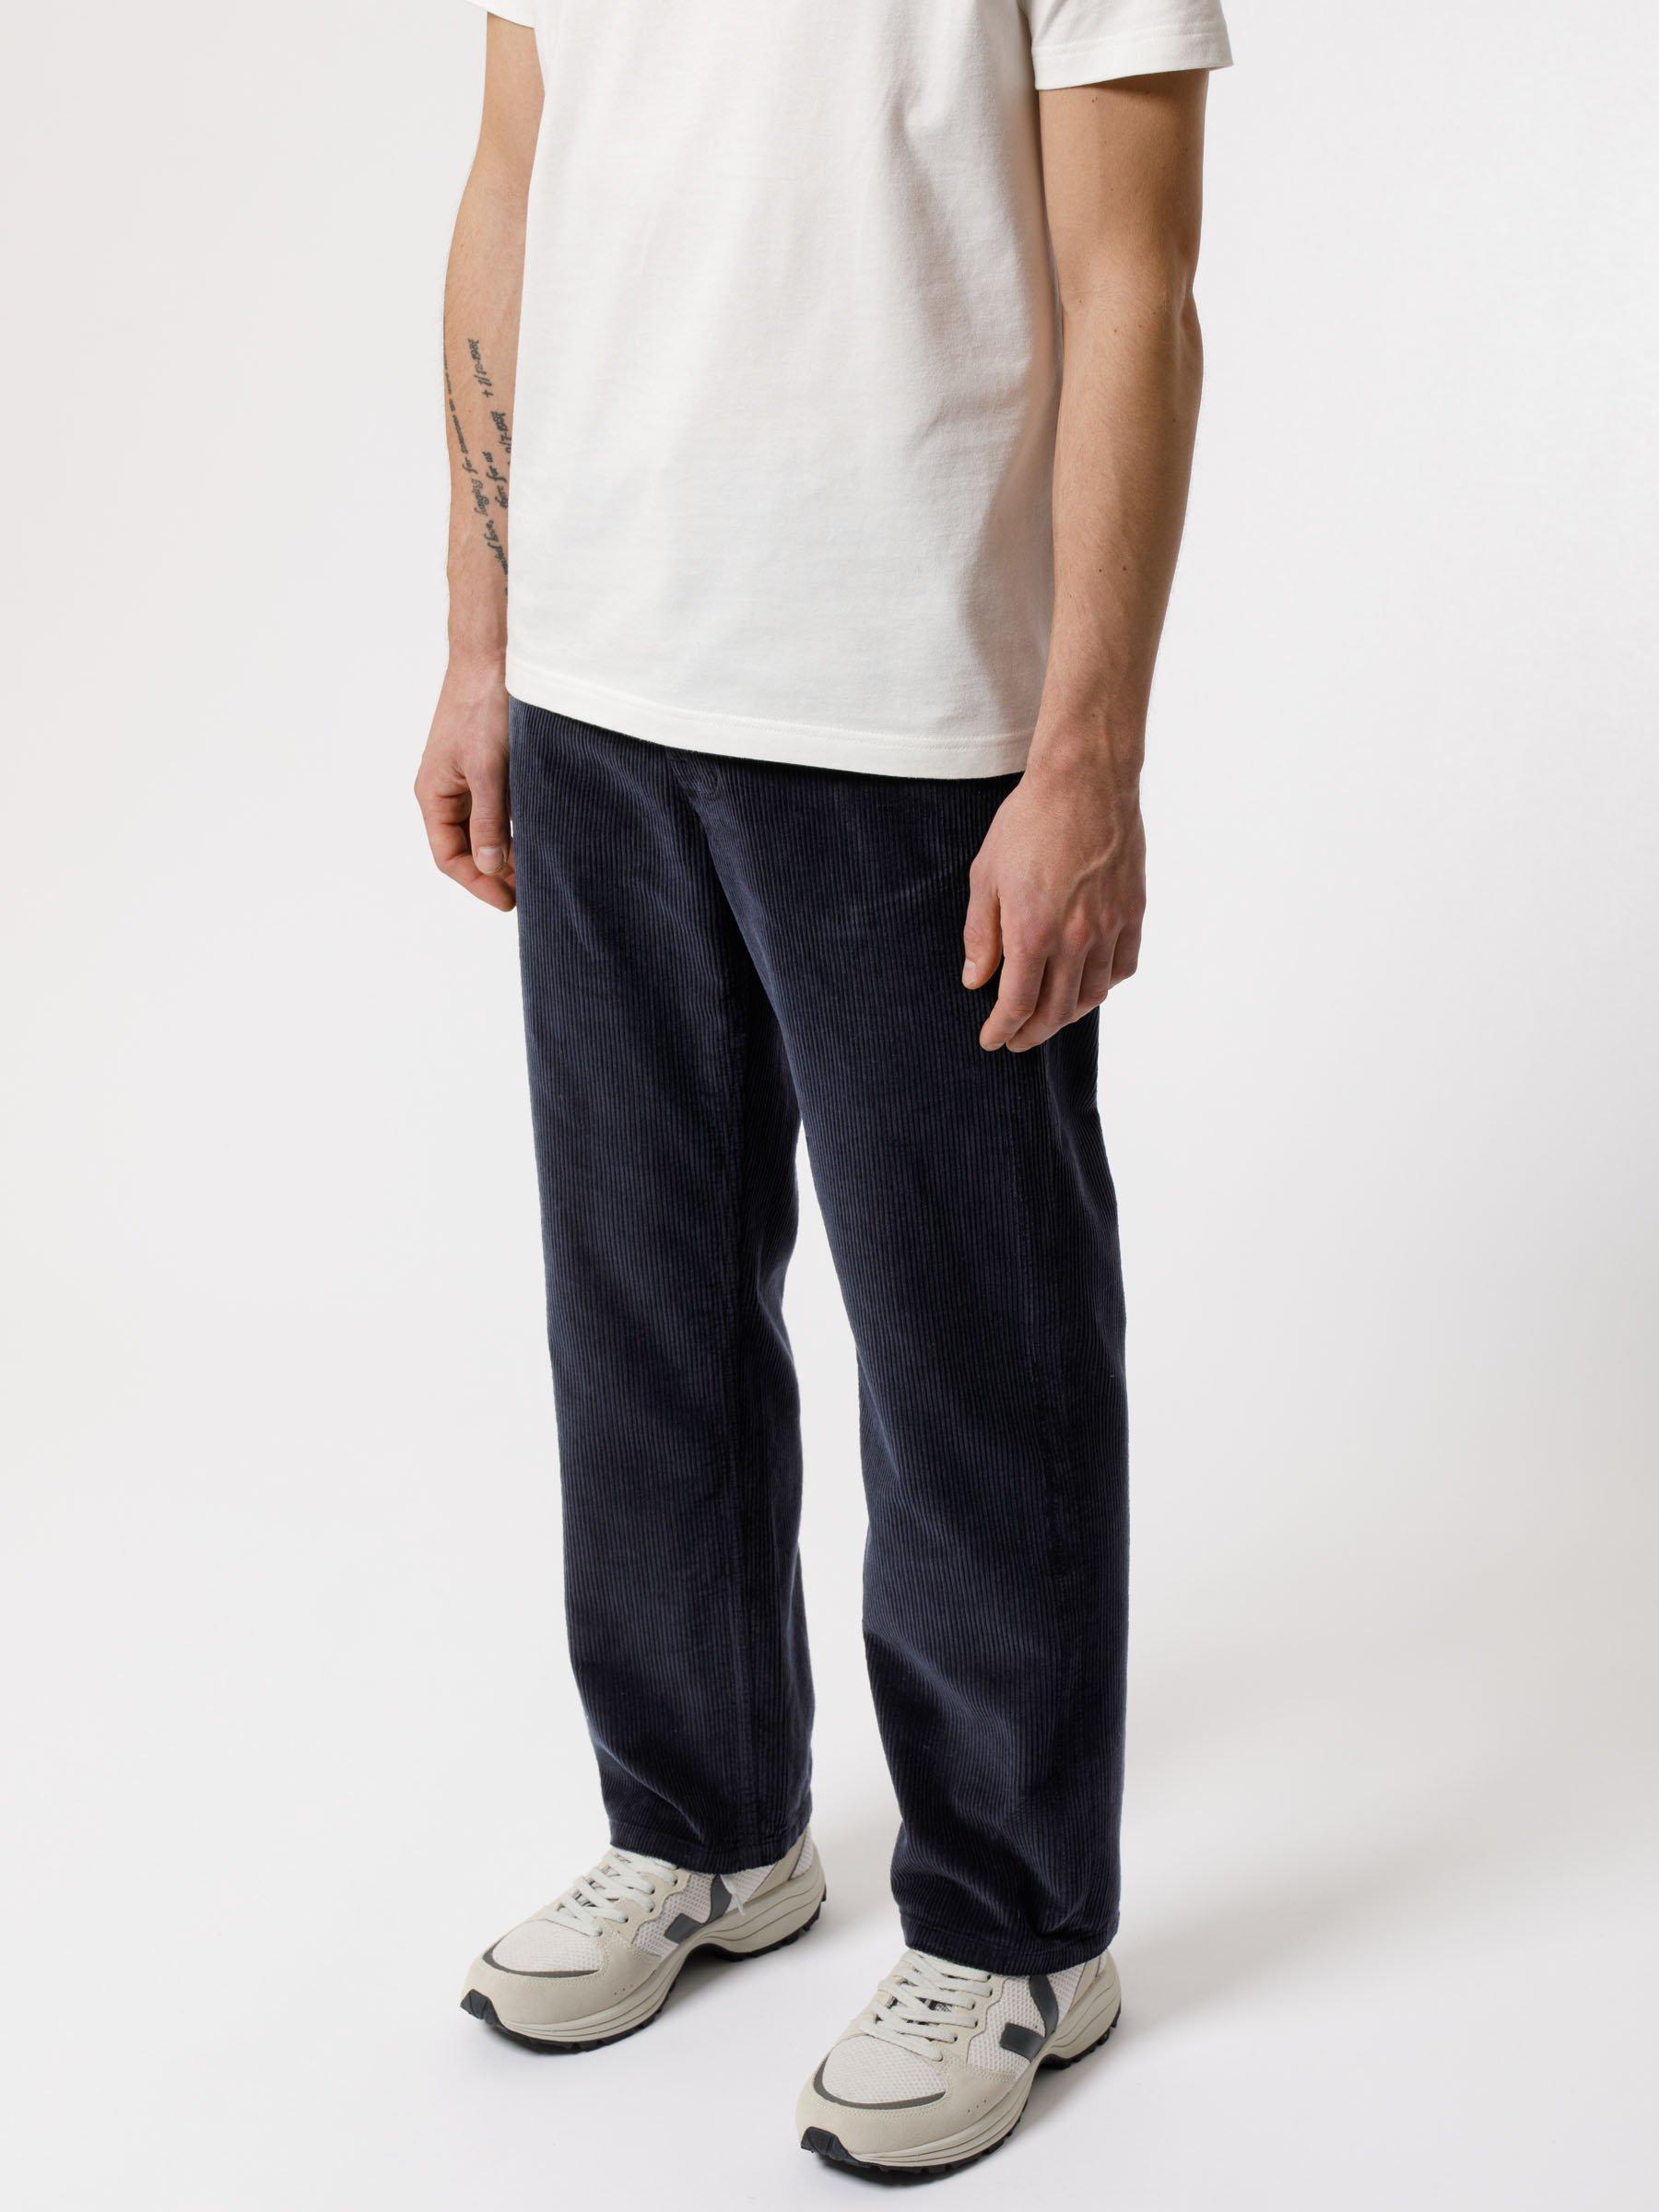 mespromenades-le-pantalon-dautmne-nudie-jeans-Lazy-Leo-Cord-Navy-120188-14_2400x2400